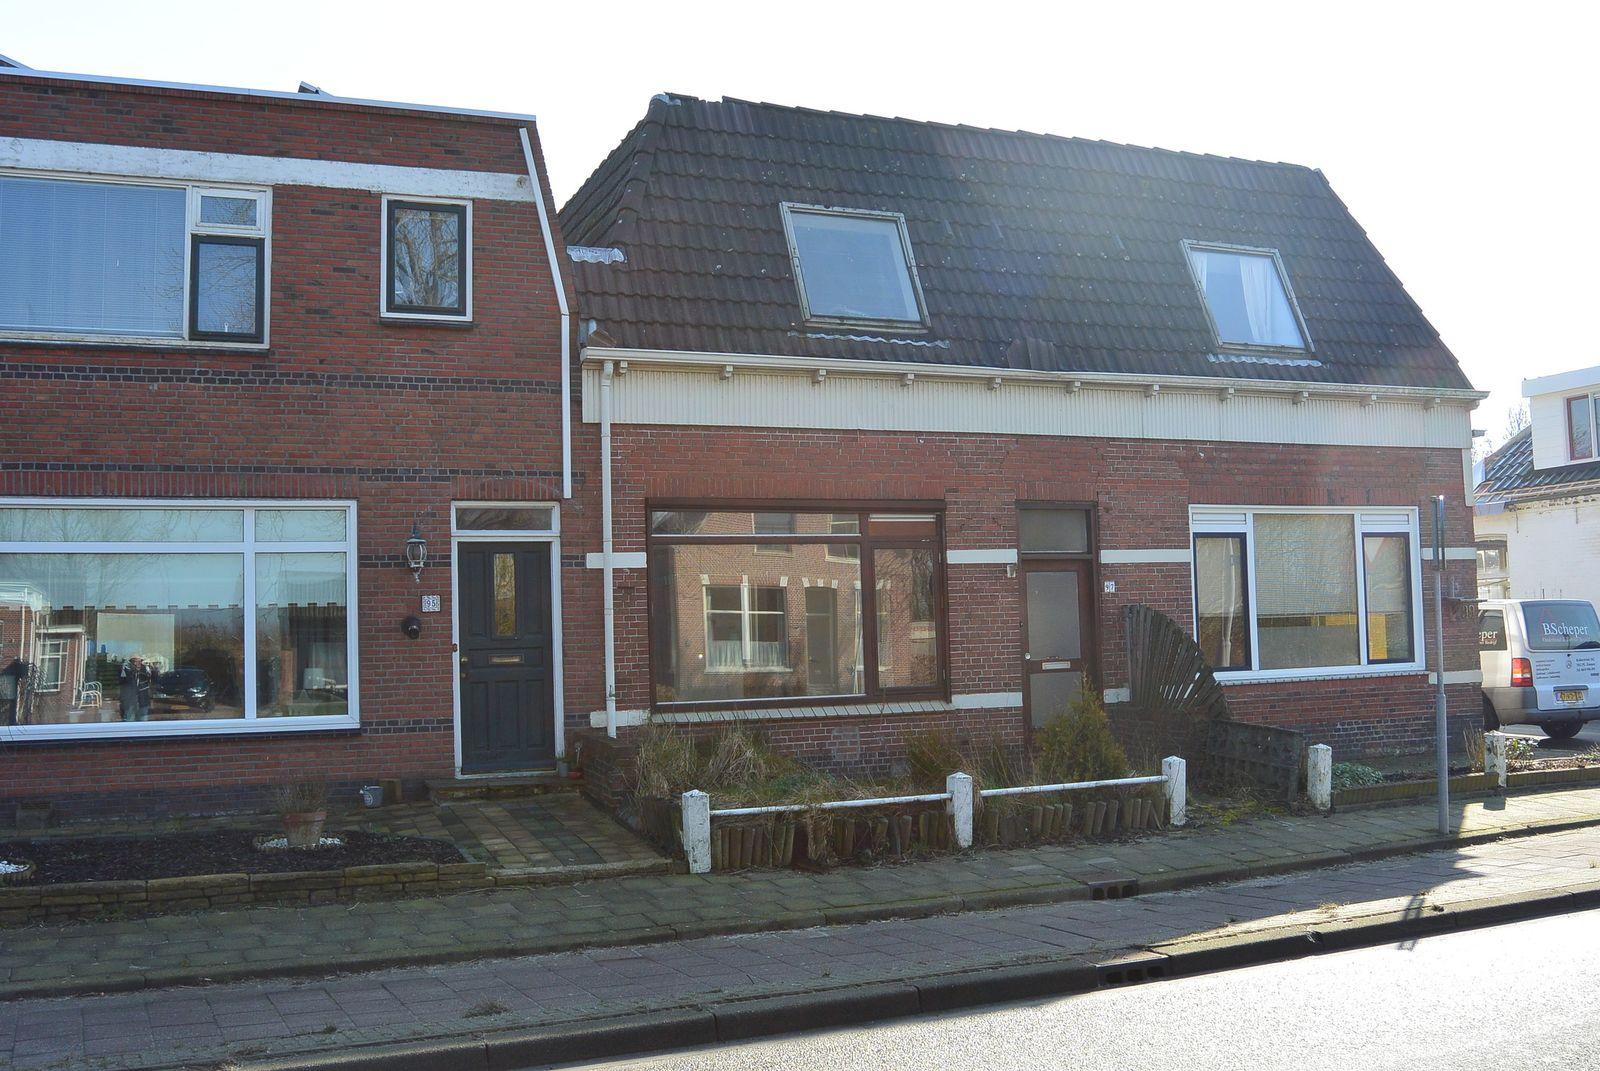 Woldweg 97, Appingedam